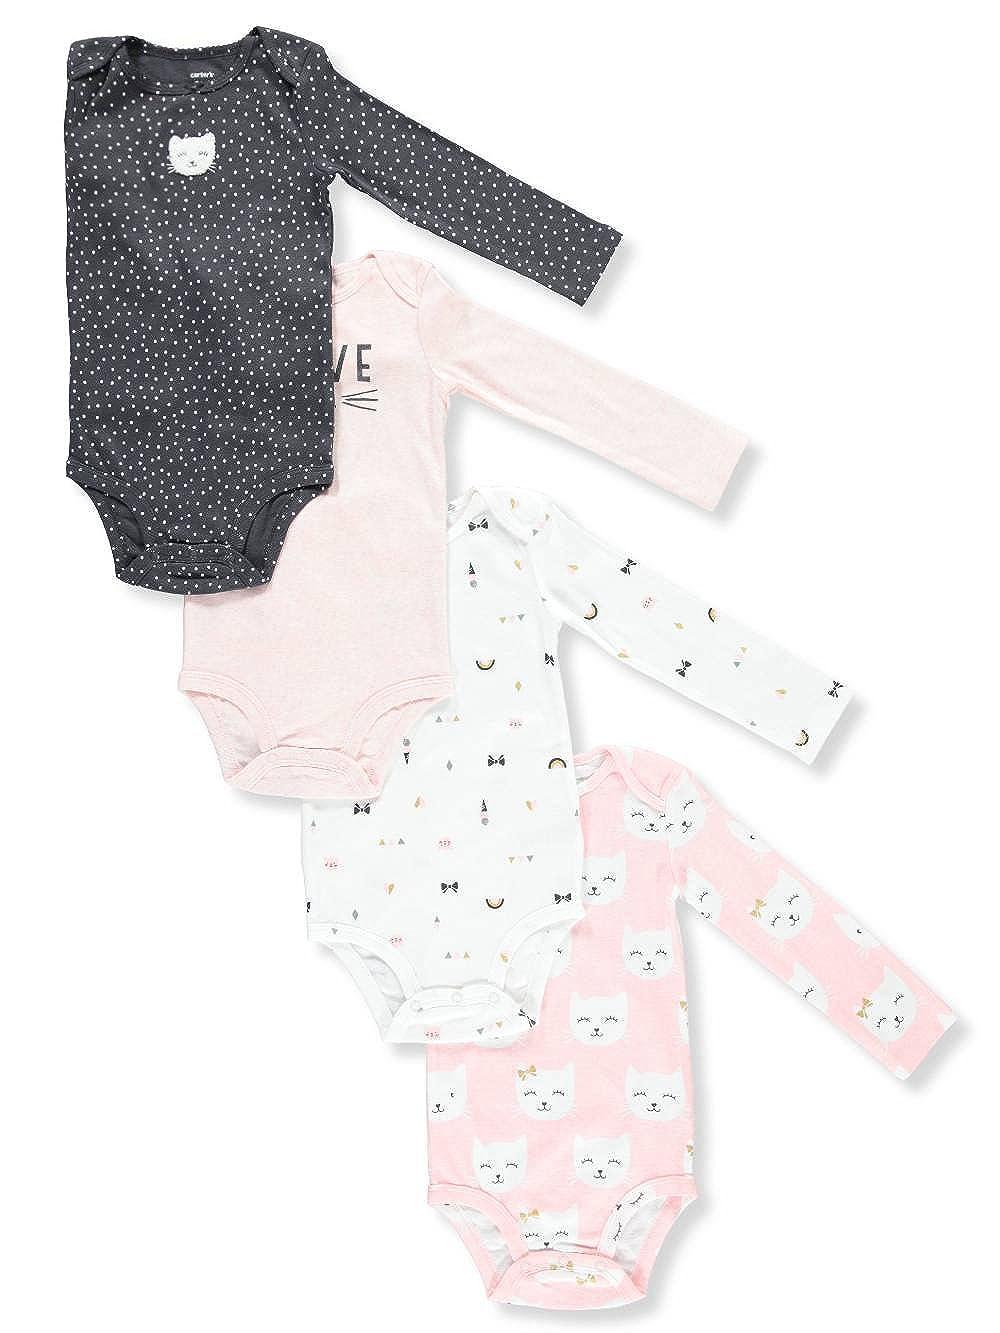 Carter's SHIRT ベビーガールズ 3 Months Charcoal Gray/Pink Multi B07DGS2R7B